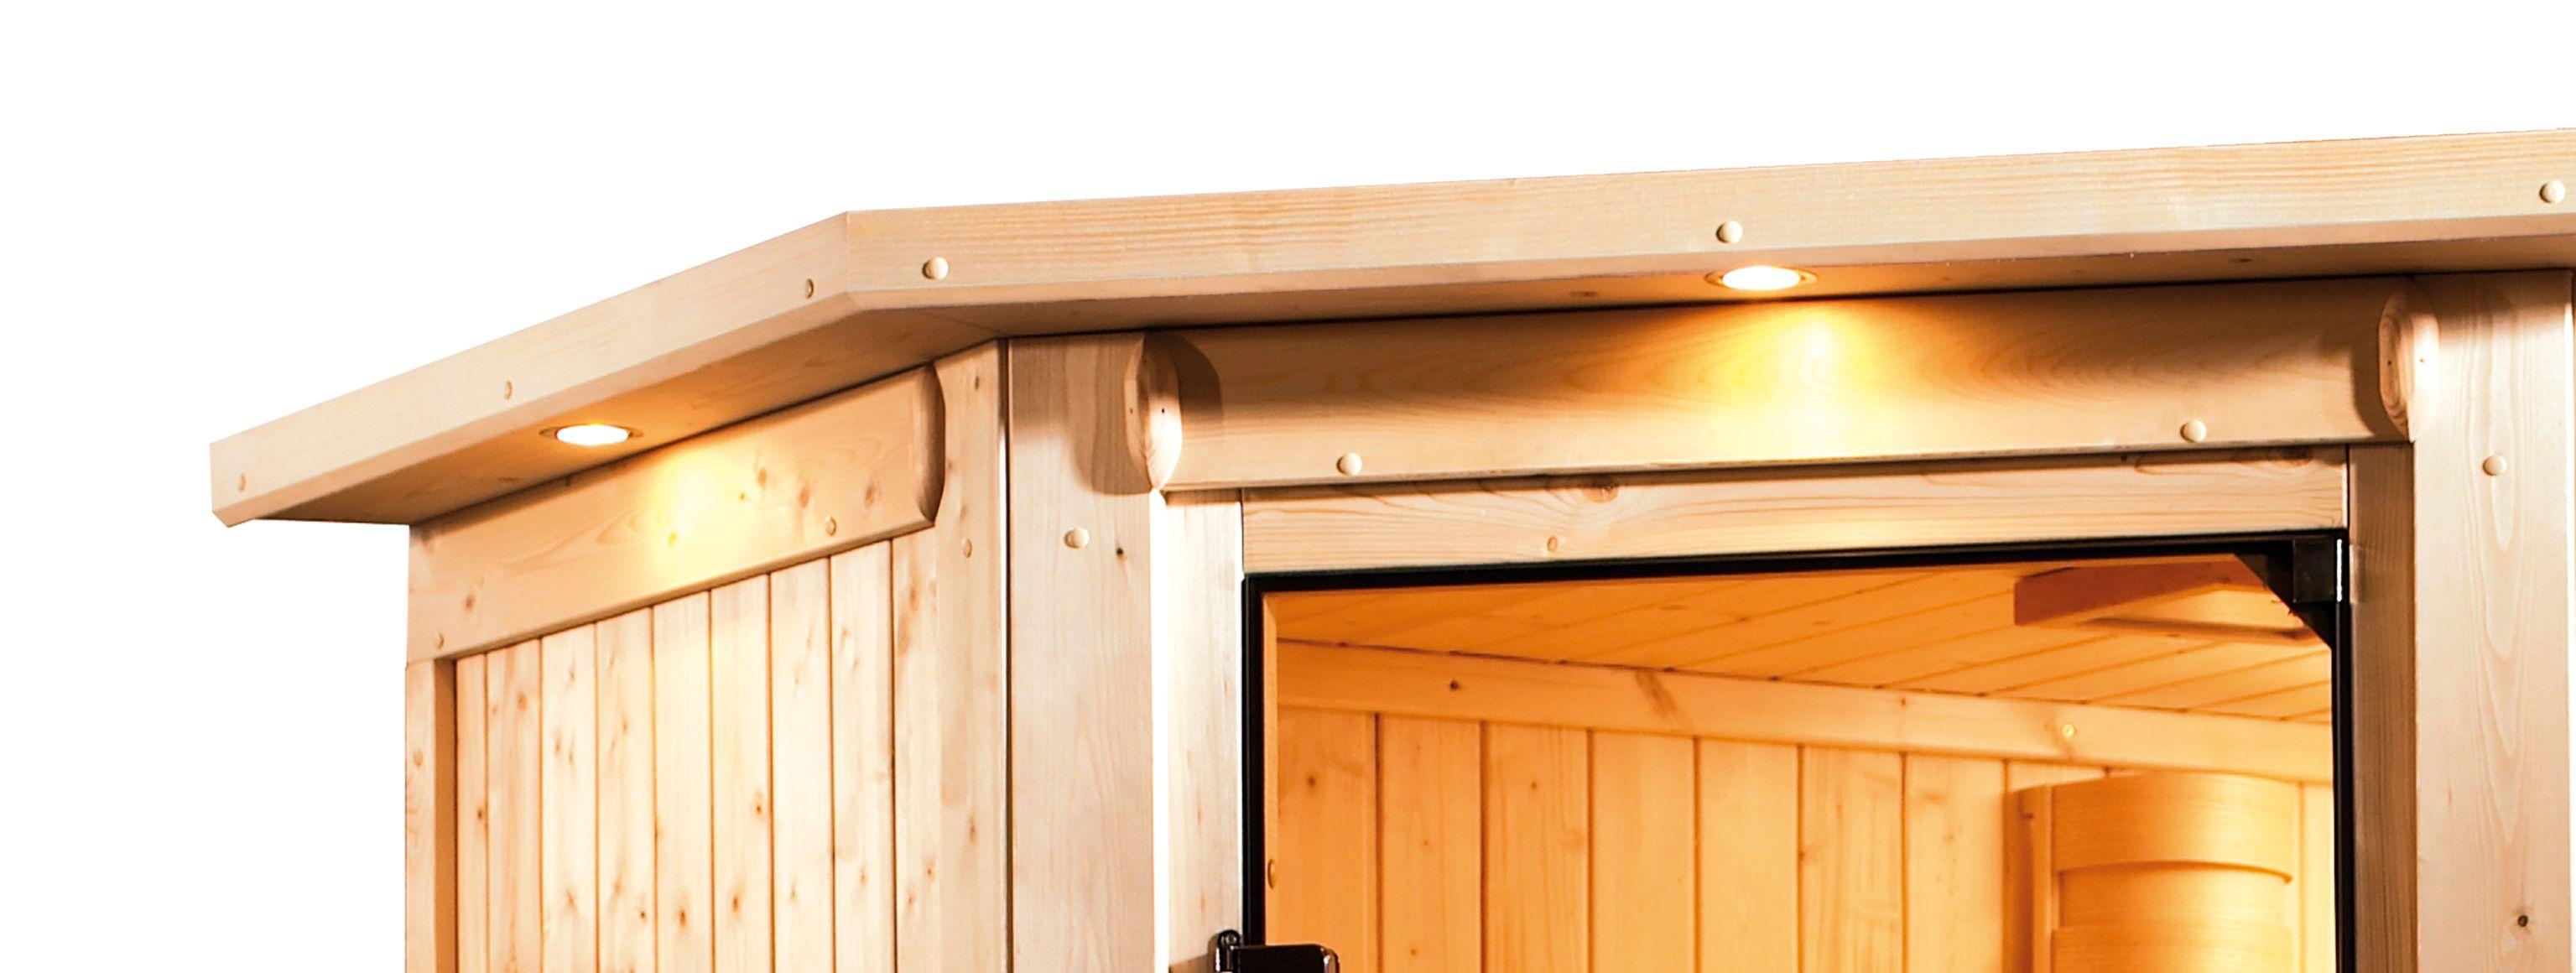 Woodfeeling Sauna Kiana 38mm Dachkranz Bio Saunaofen 9 kW extern Bild 8